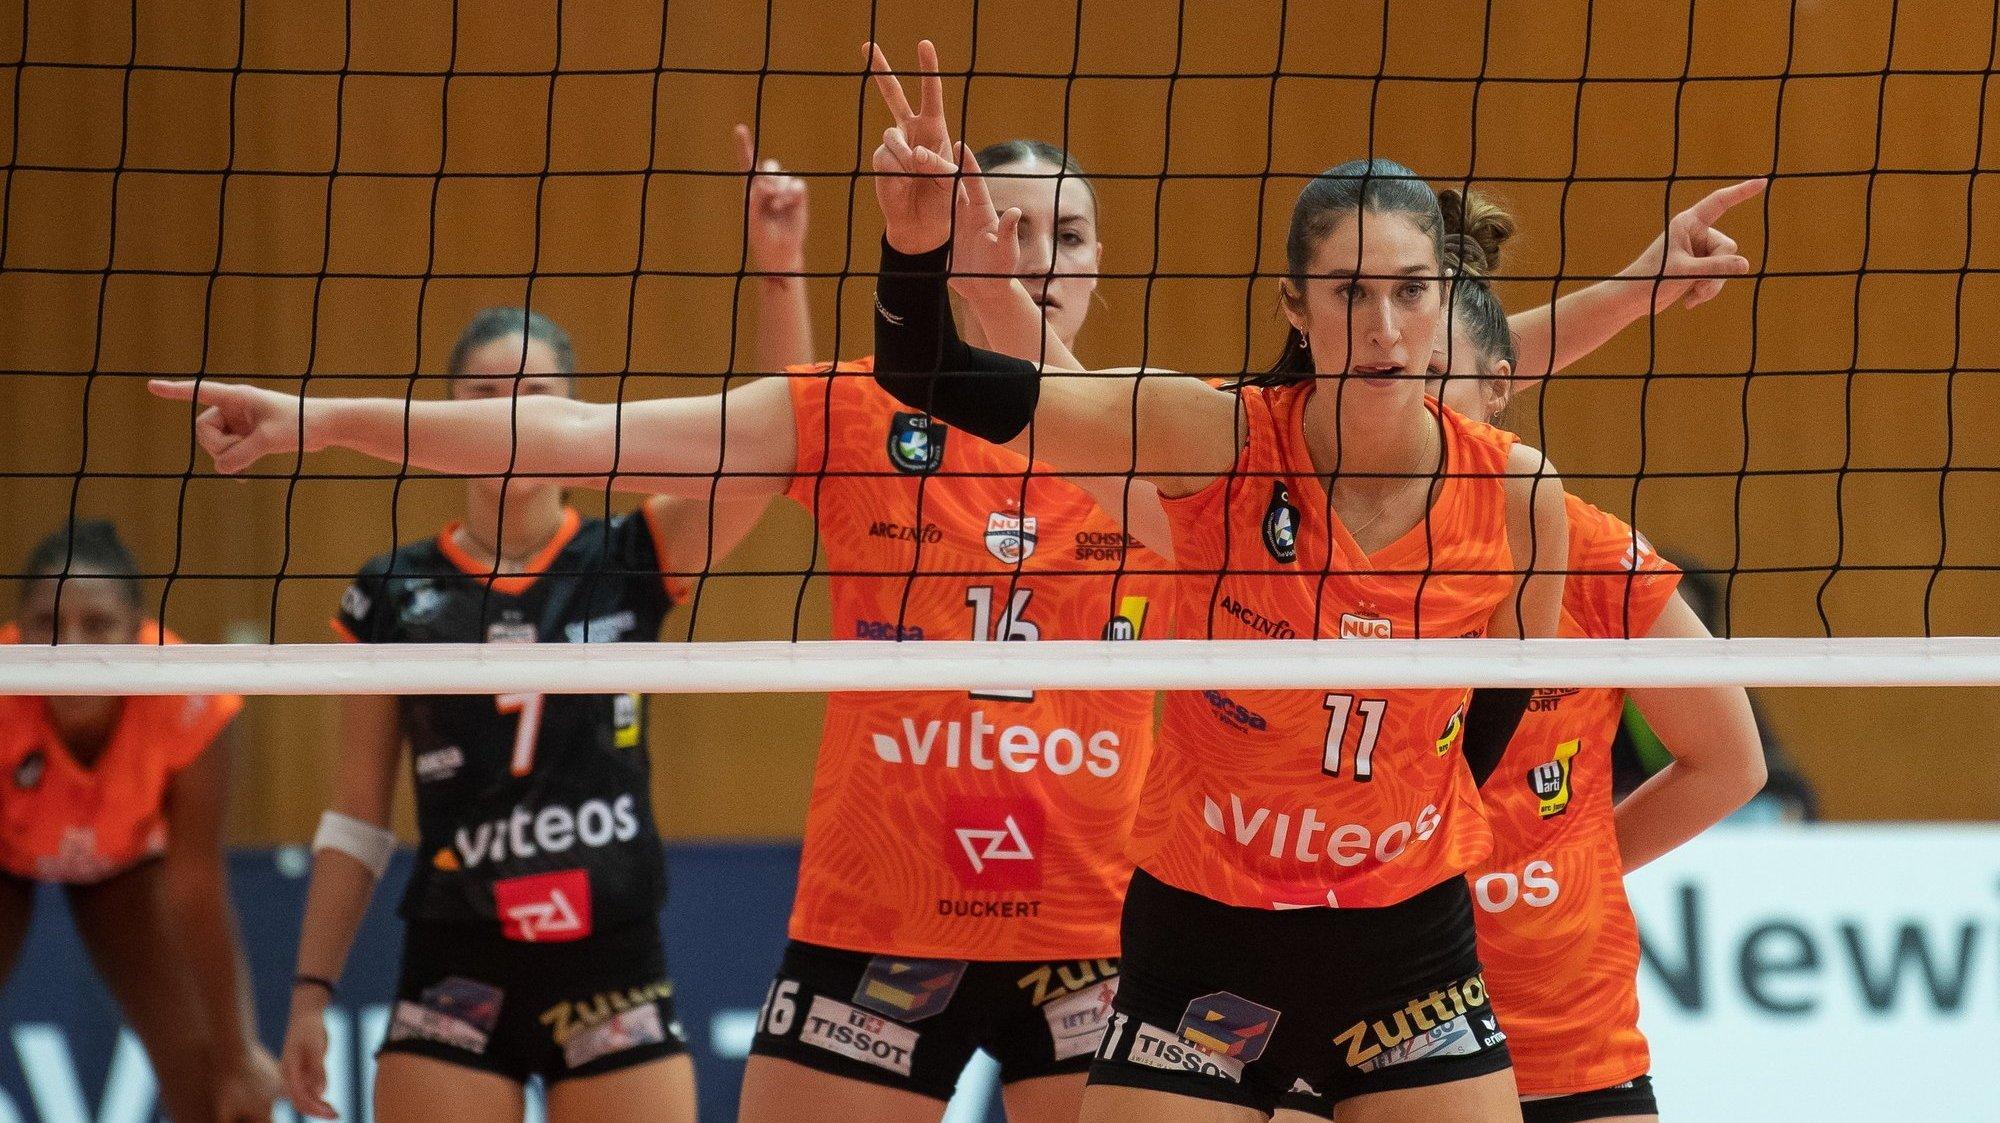 Victoire du NUC contre Lugano, Valtra perd contre Kanti Schaffhouse